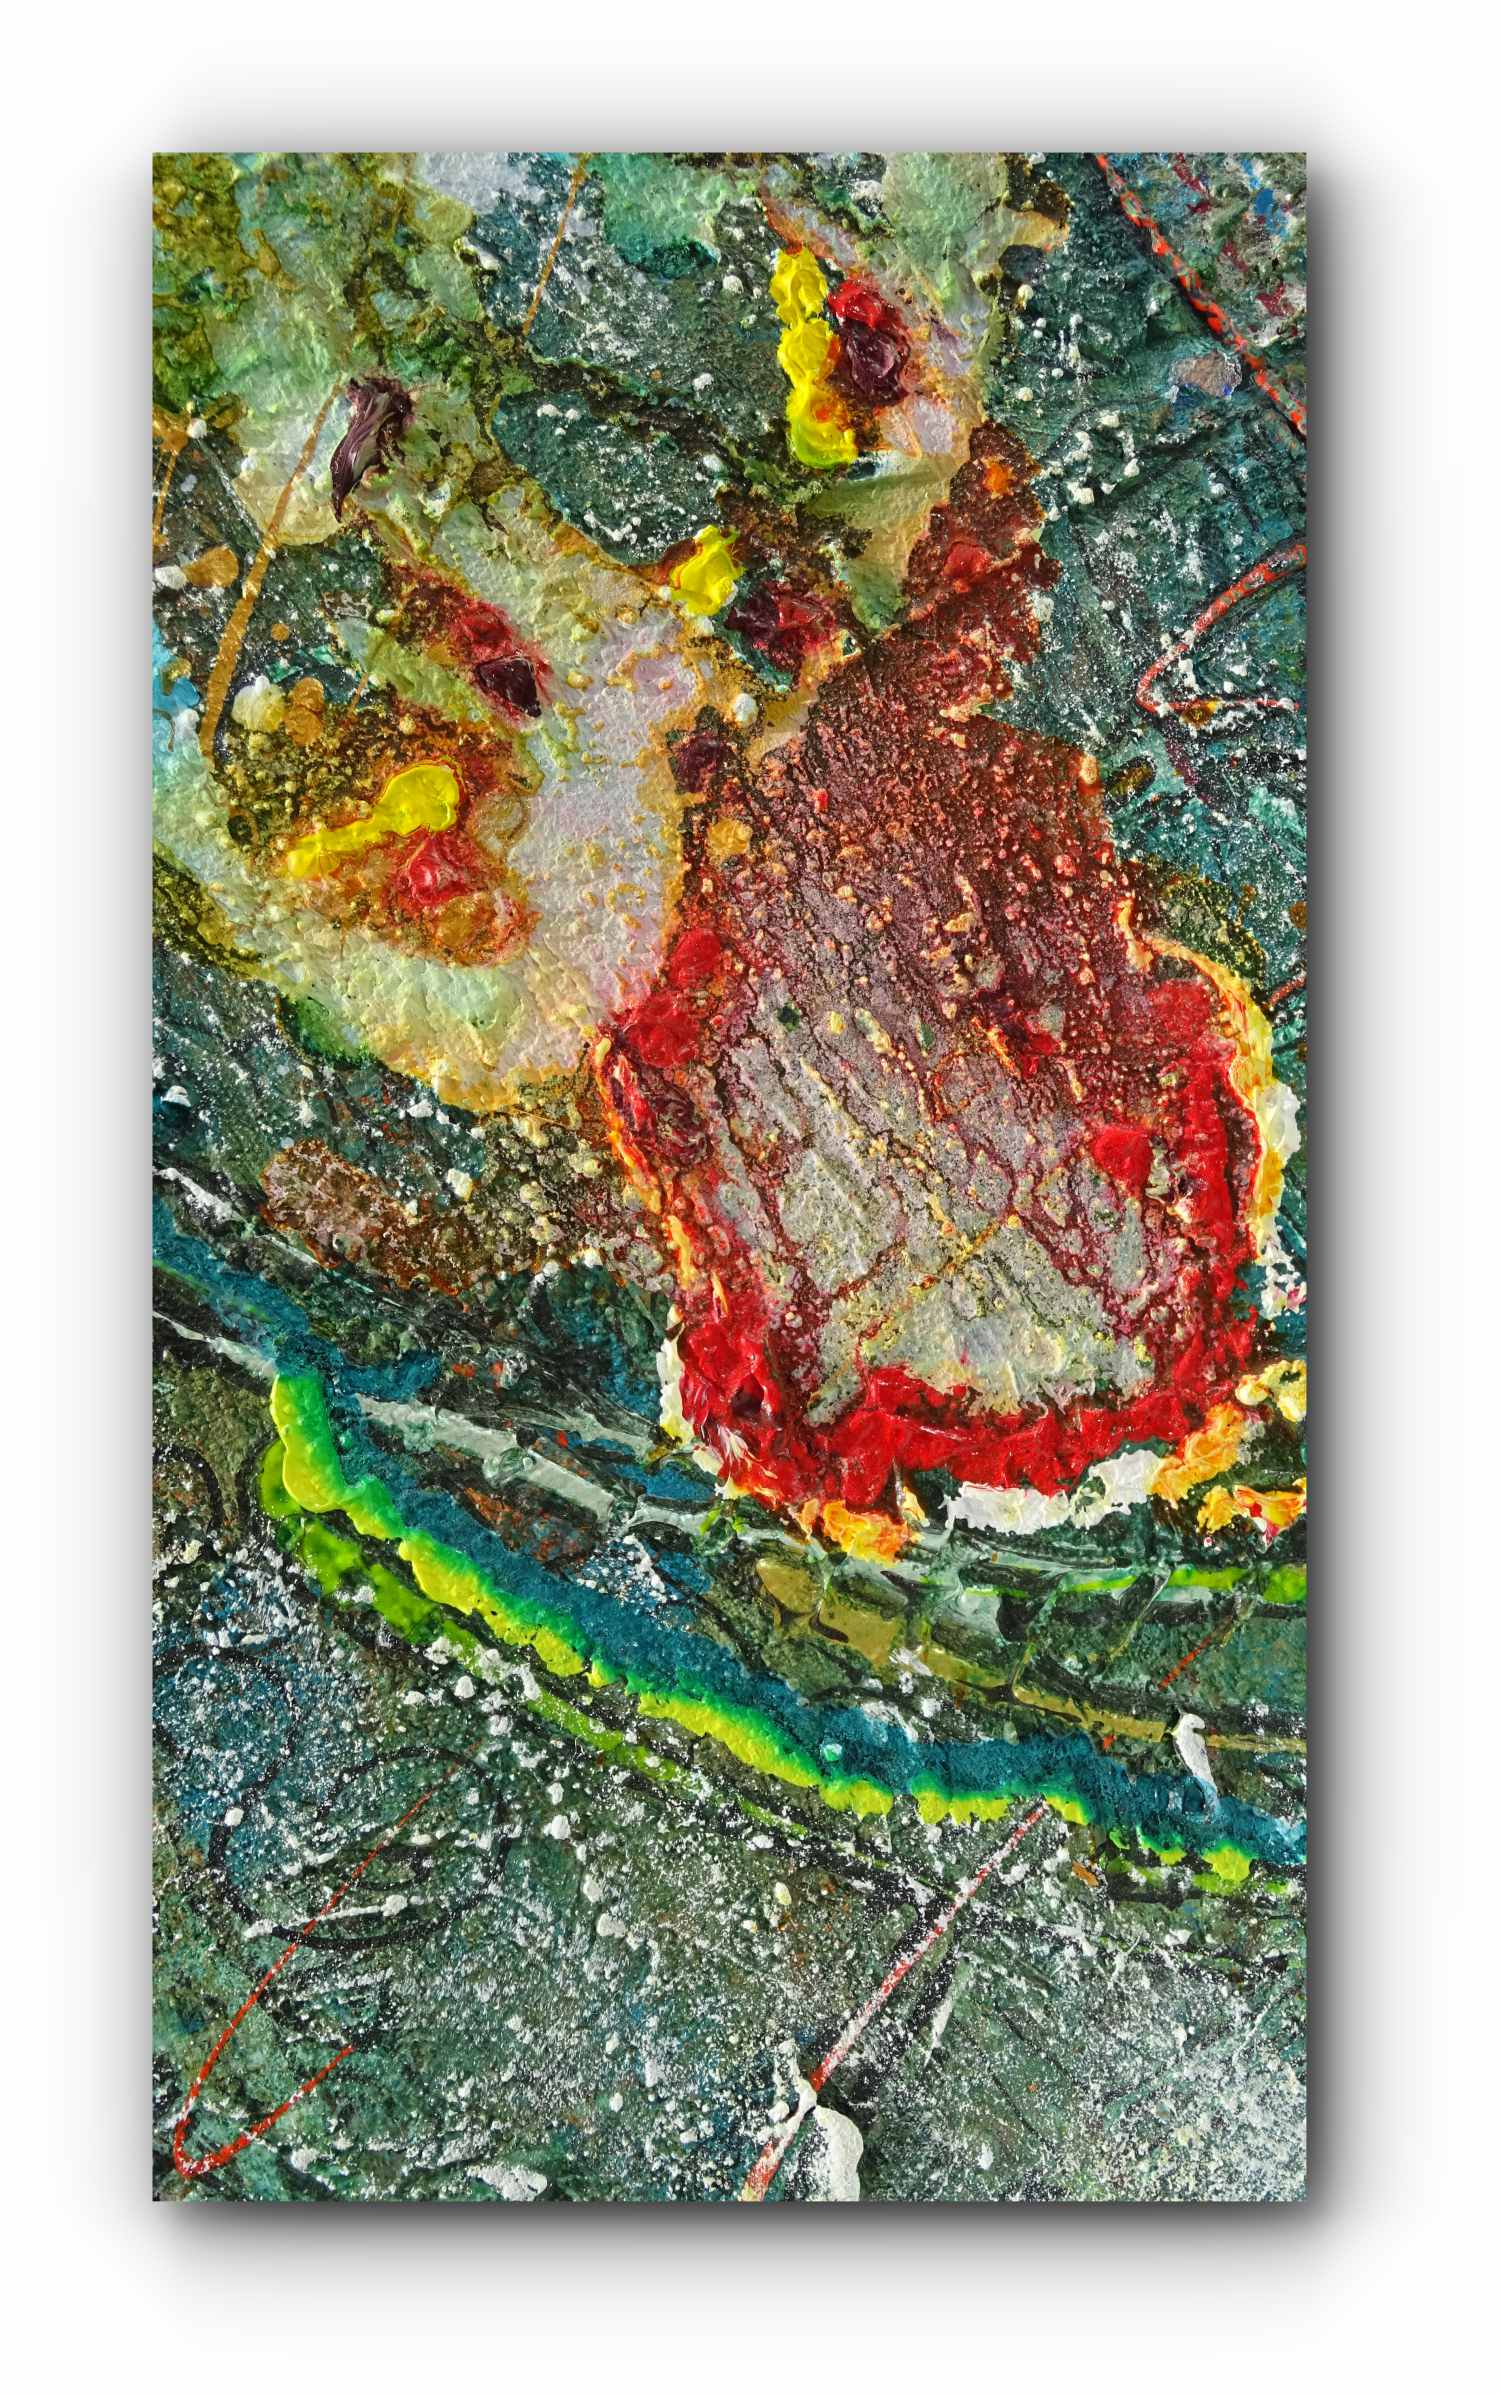 painting-detail-5-ritual-five-artists-ingress-vortices.jpg